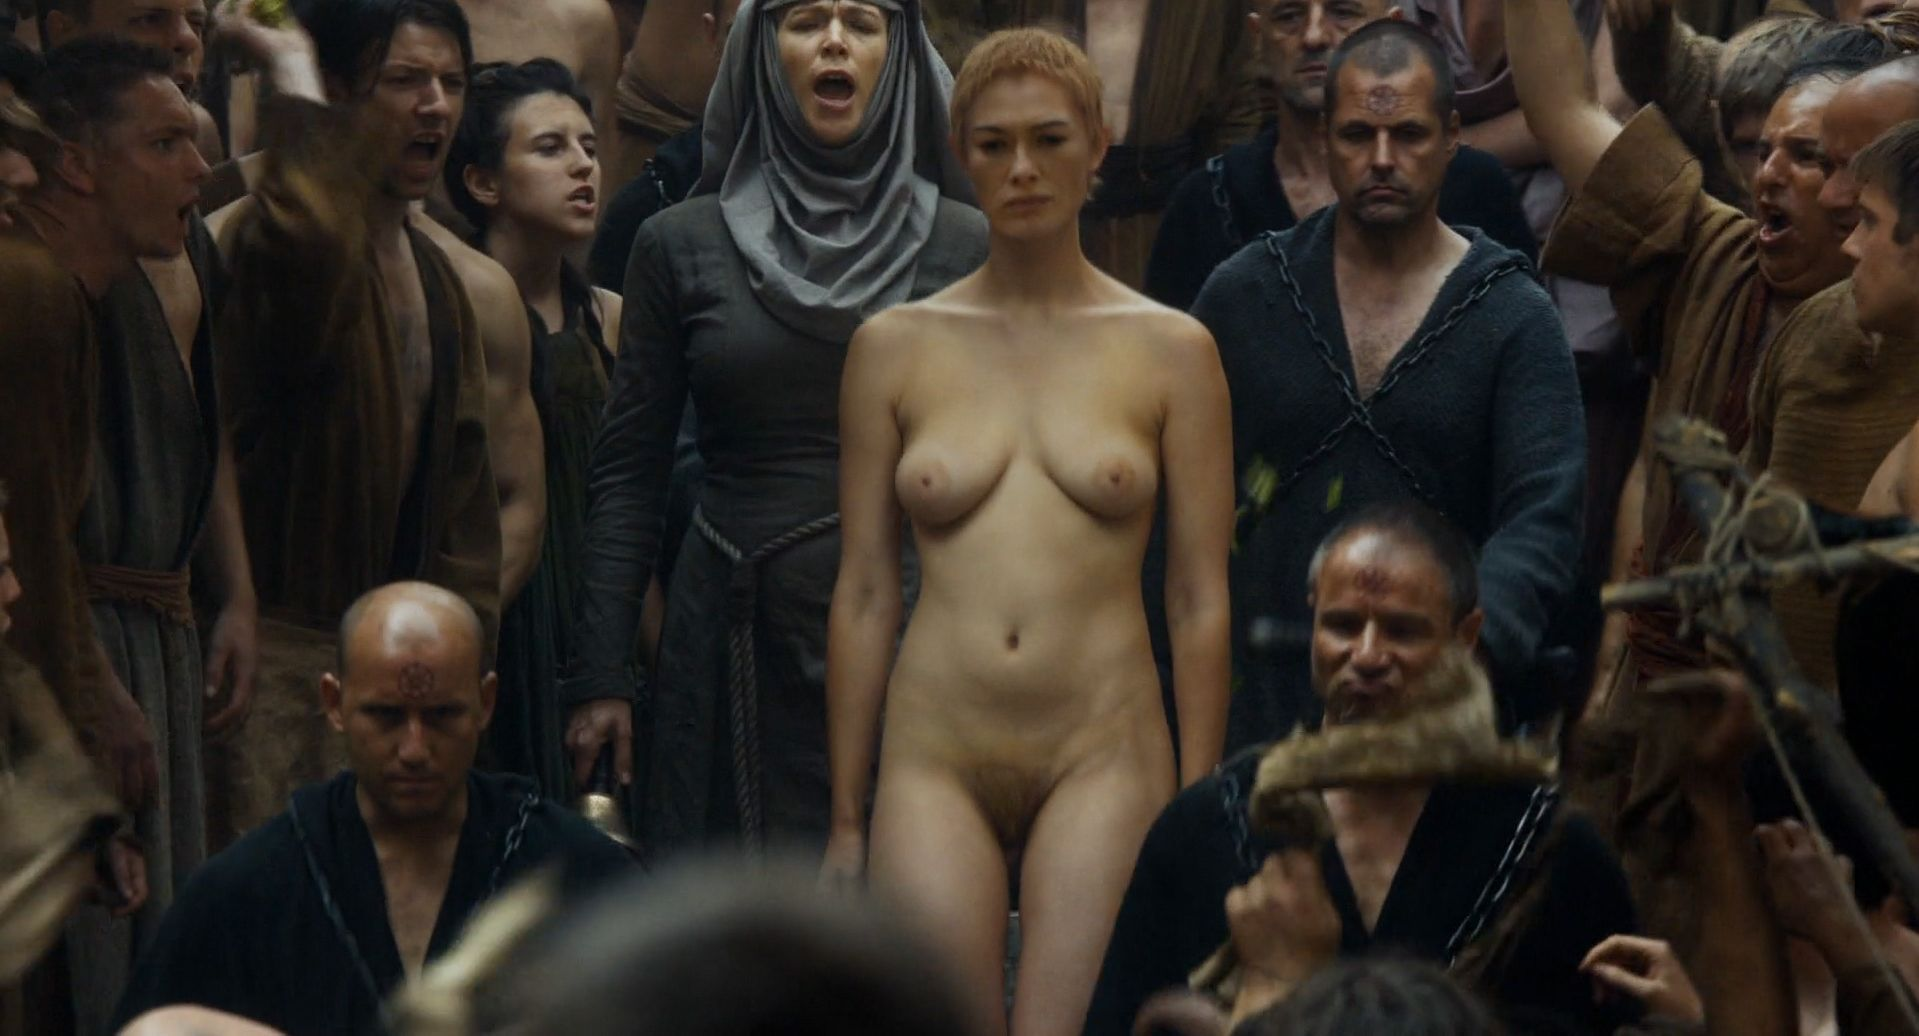 Lena Headey Nude Big Boobs and Hairy Pussy